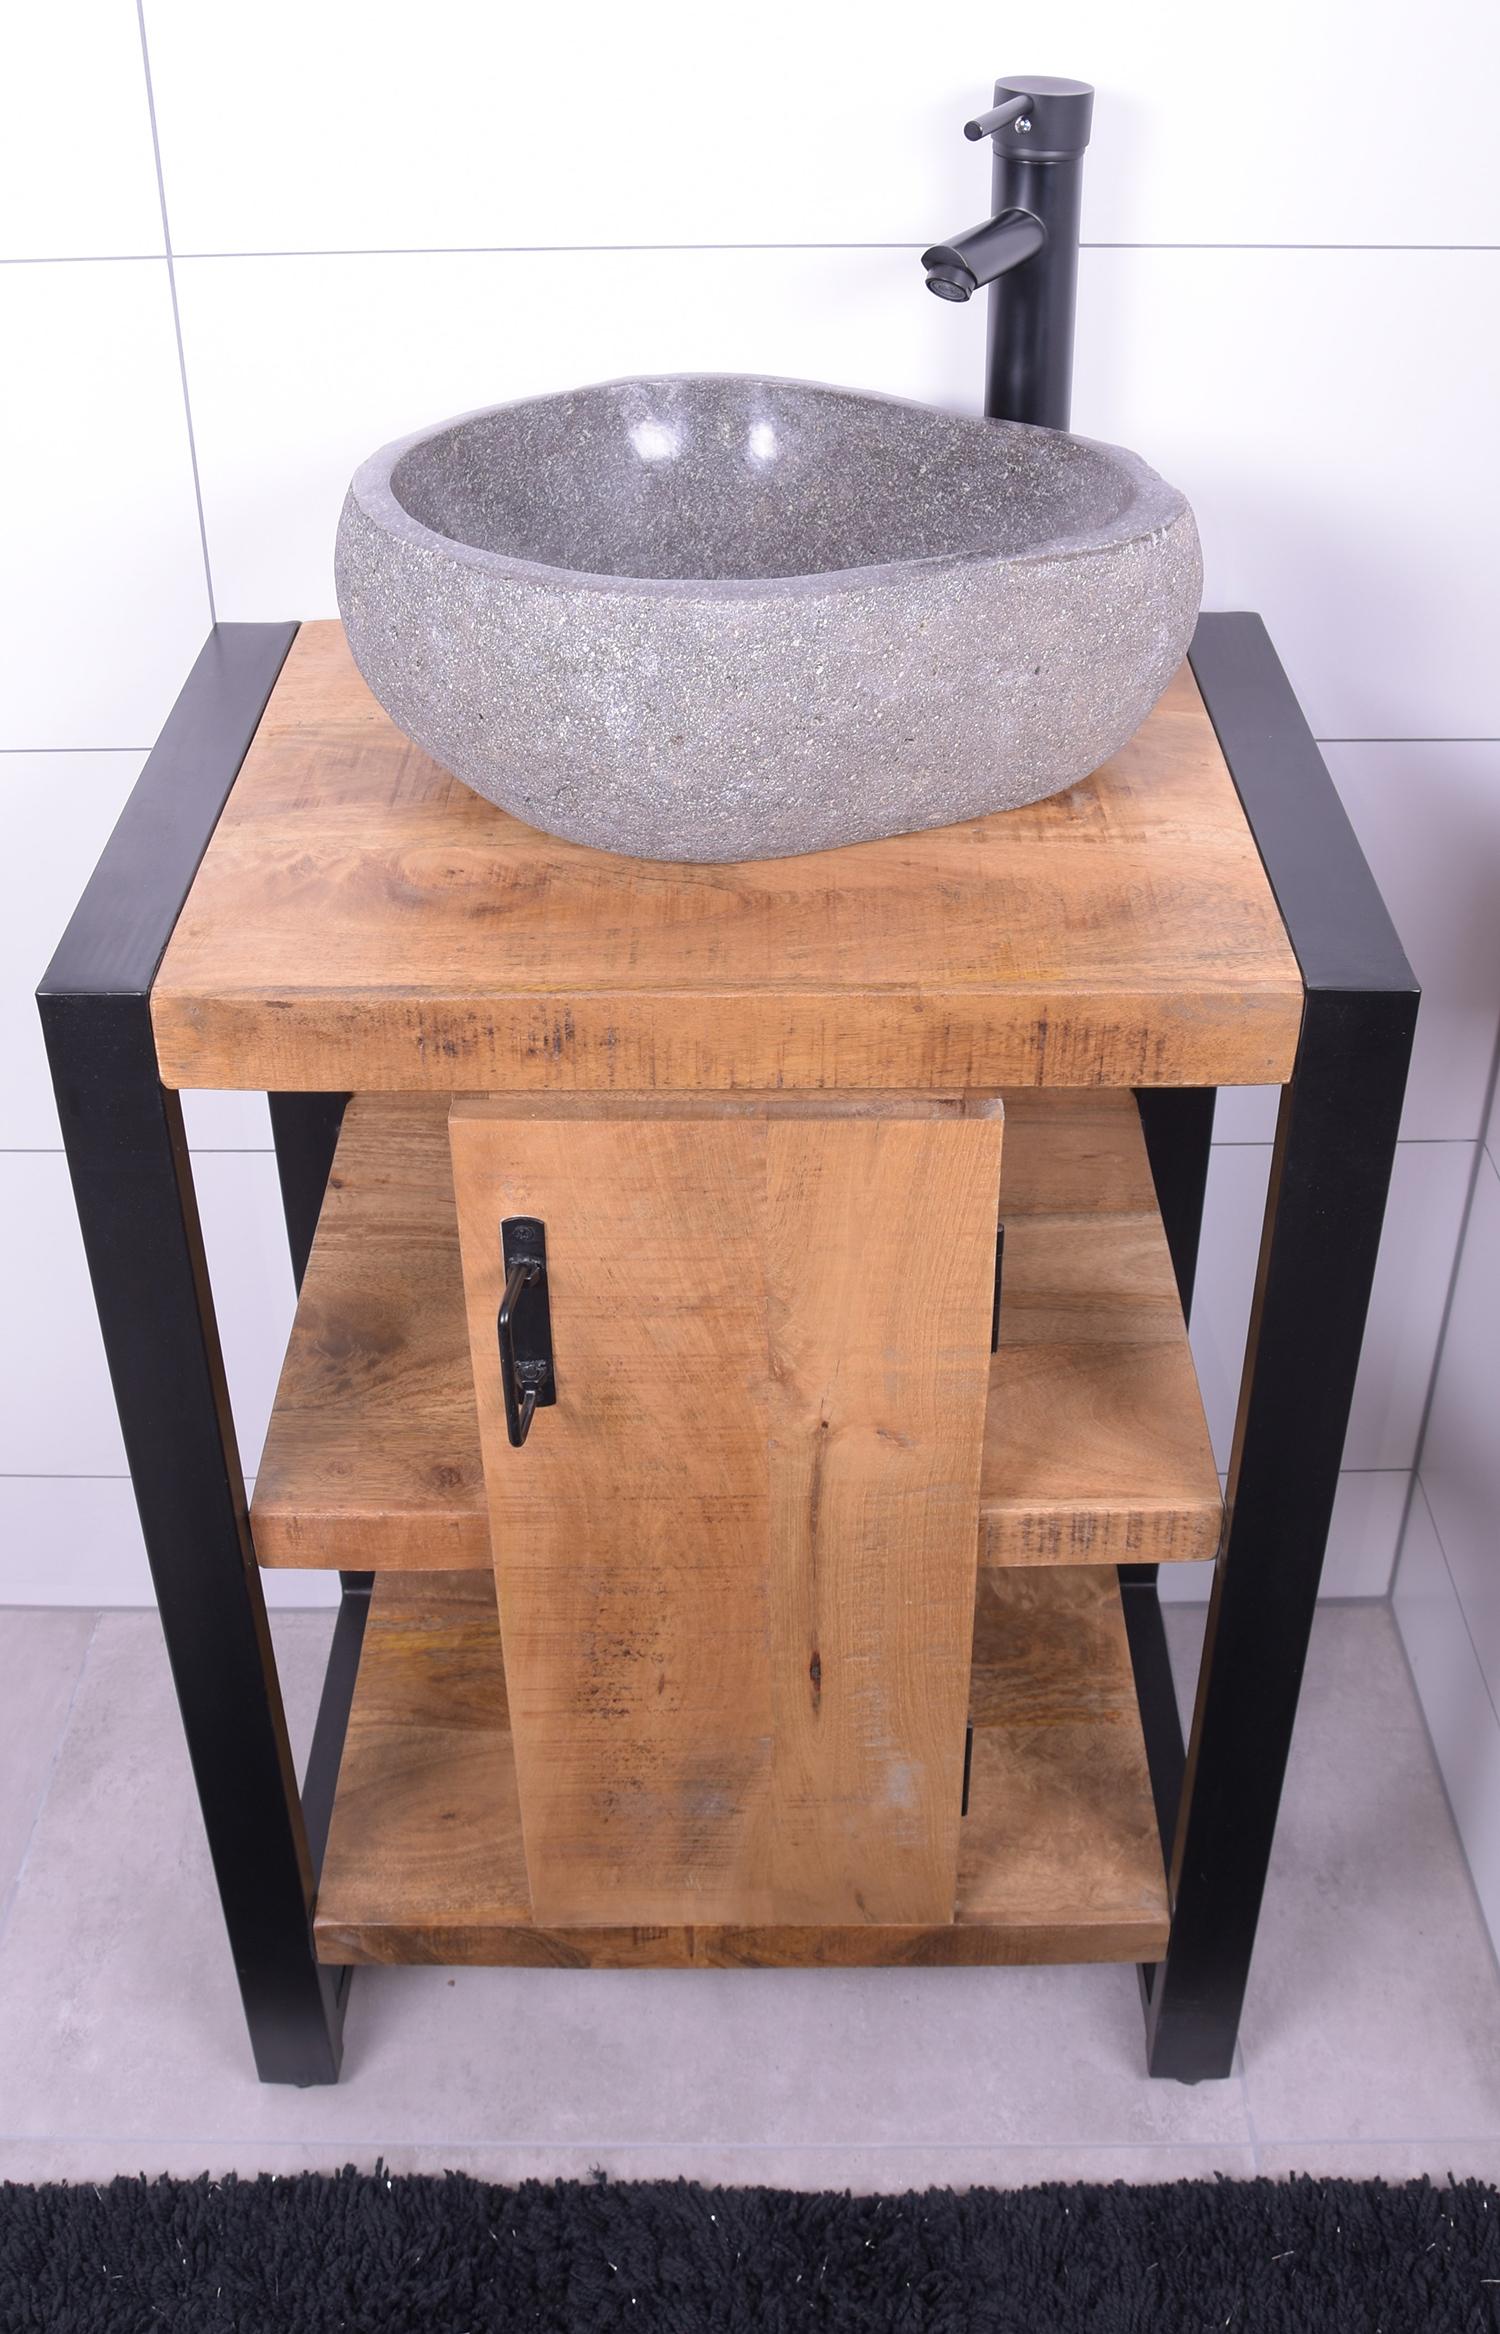 MD Interior Mocu mangohout wastafelmeubel 60cm met riviersteen kom